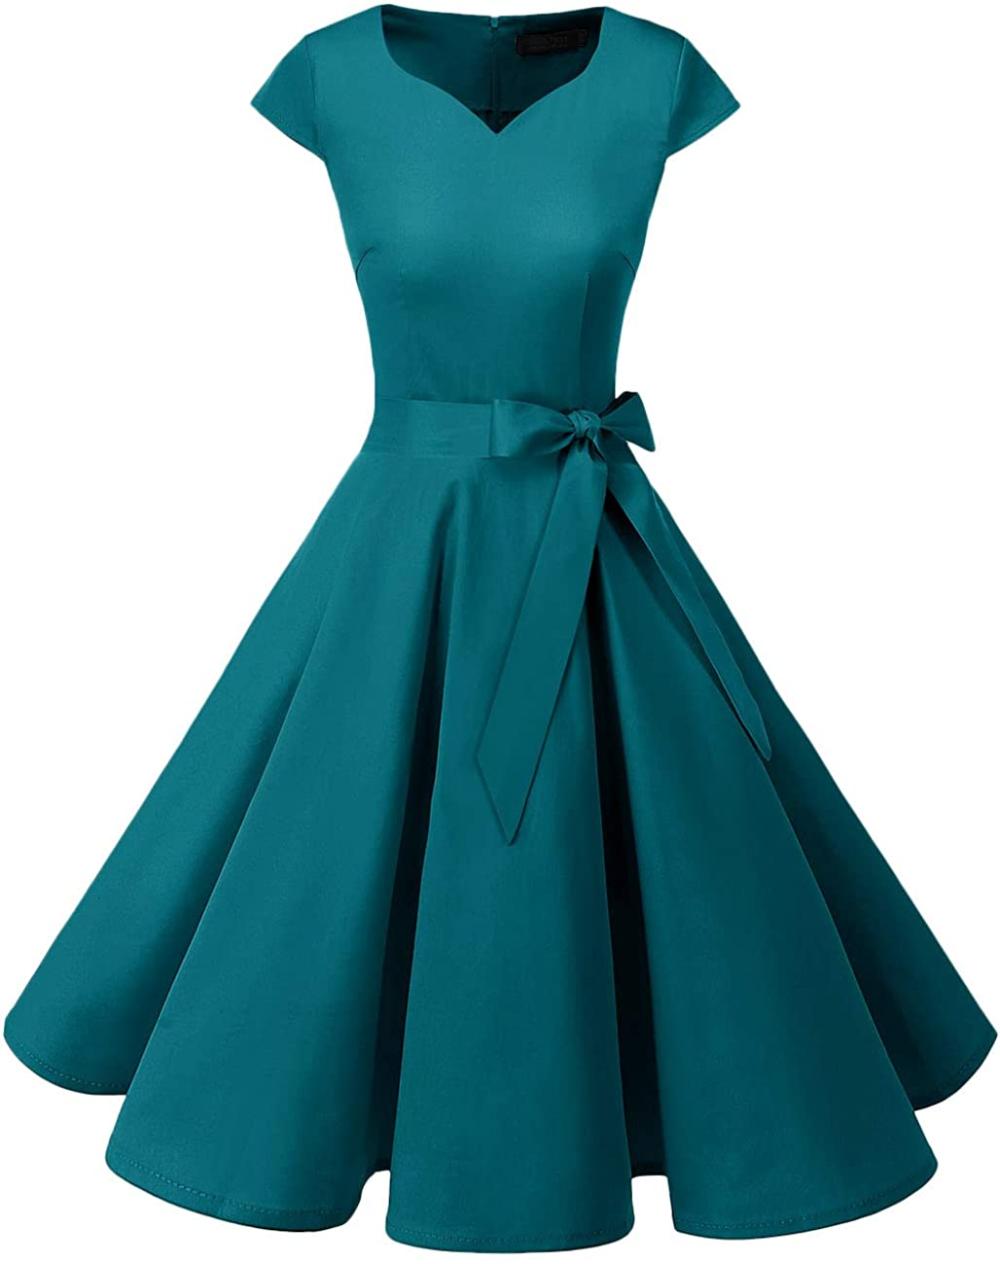 Amazon Com Dresstells 50s Style Retro Pinup Dress Audrey Hepburn Style Blush S Clothing Dresses Cocktail Dress Womens Cocktail Dresses [ 1264 x 1000 Pixel ]